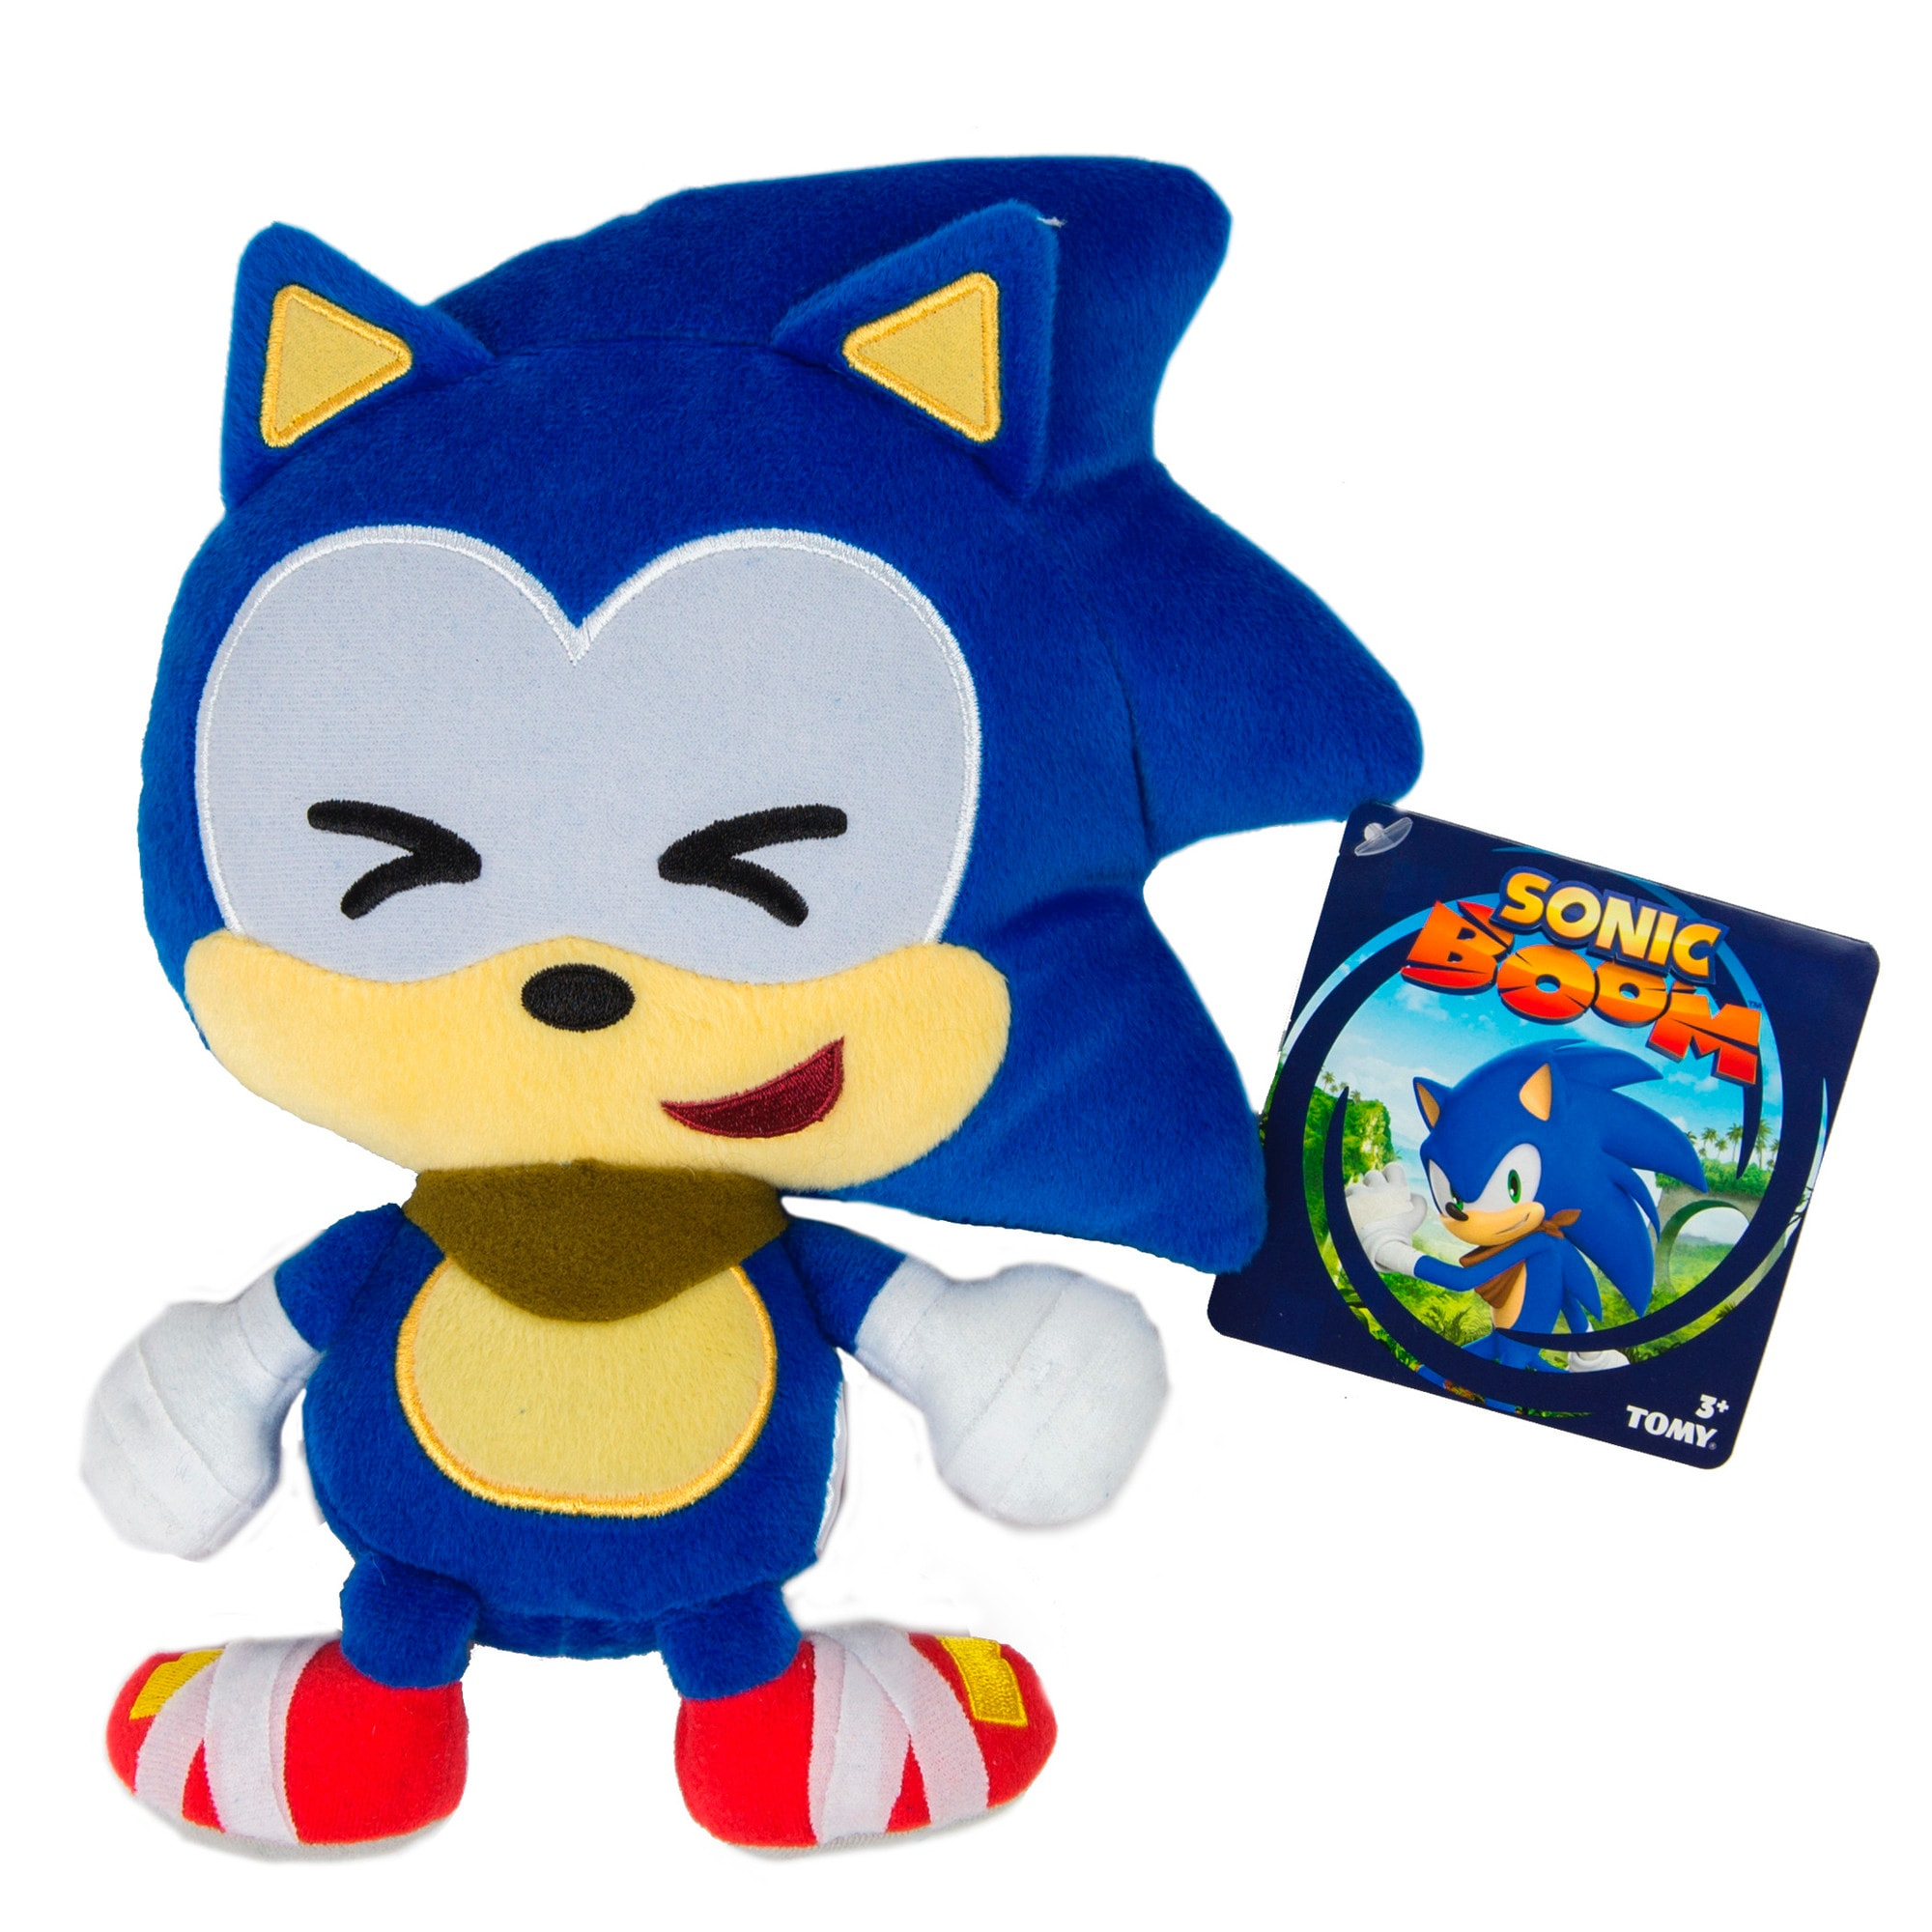 TOMY Sonic Boom Emoji Plush Cute Sonic (1)